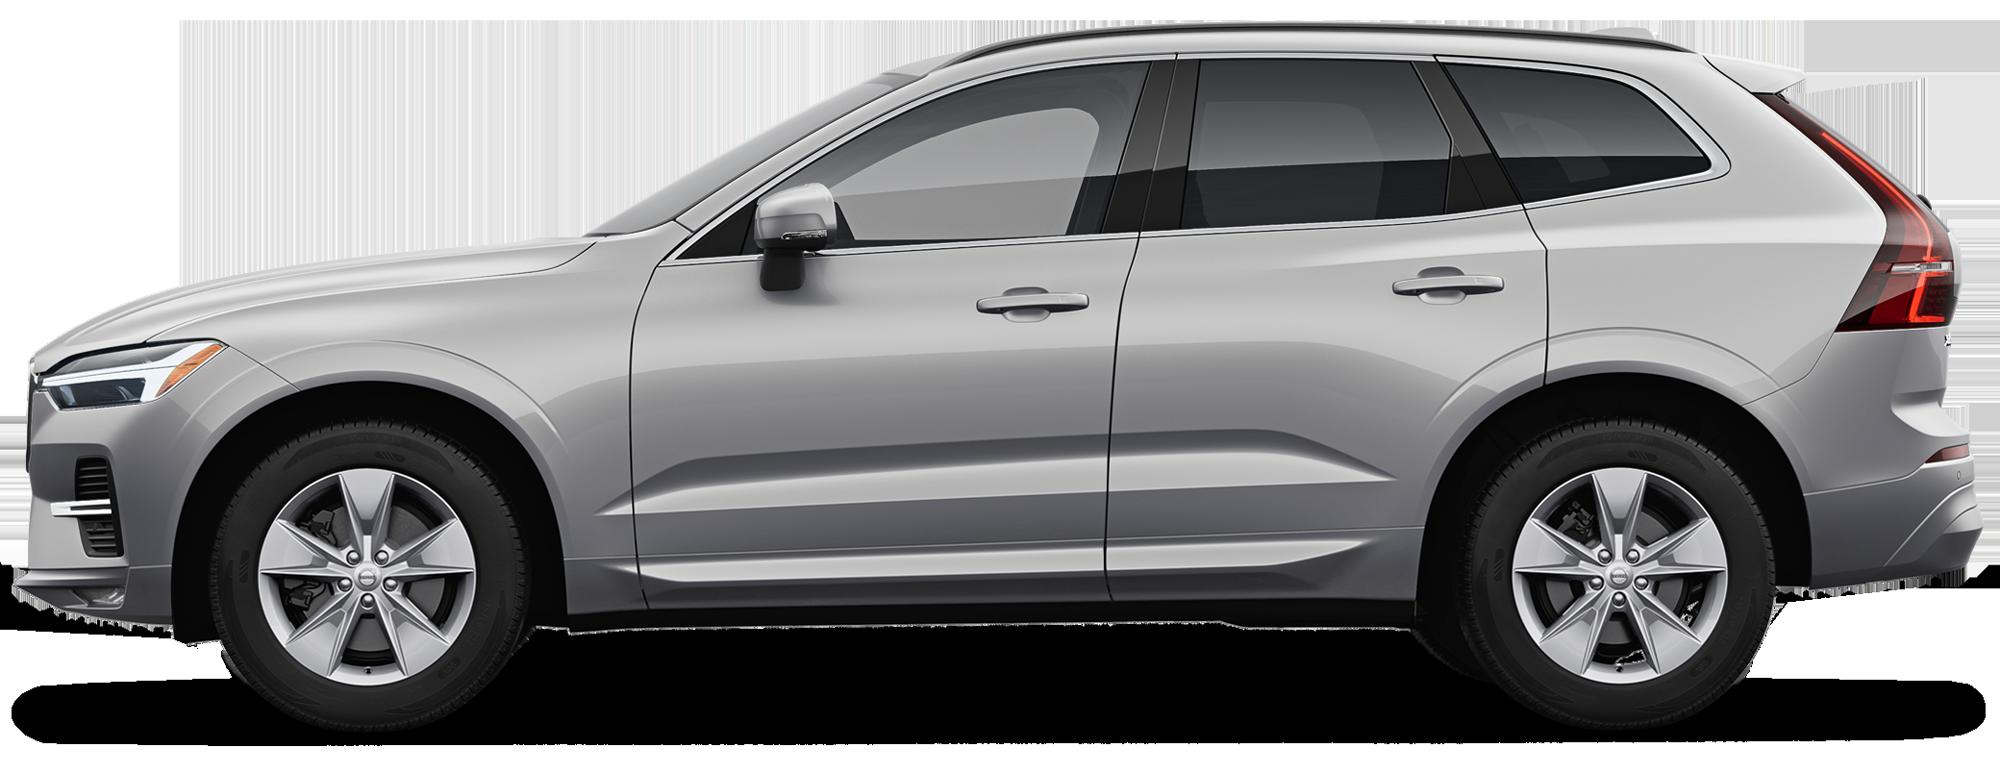 2022 Volvo XC60 SUV B5 FWD Momentum